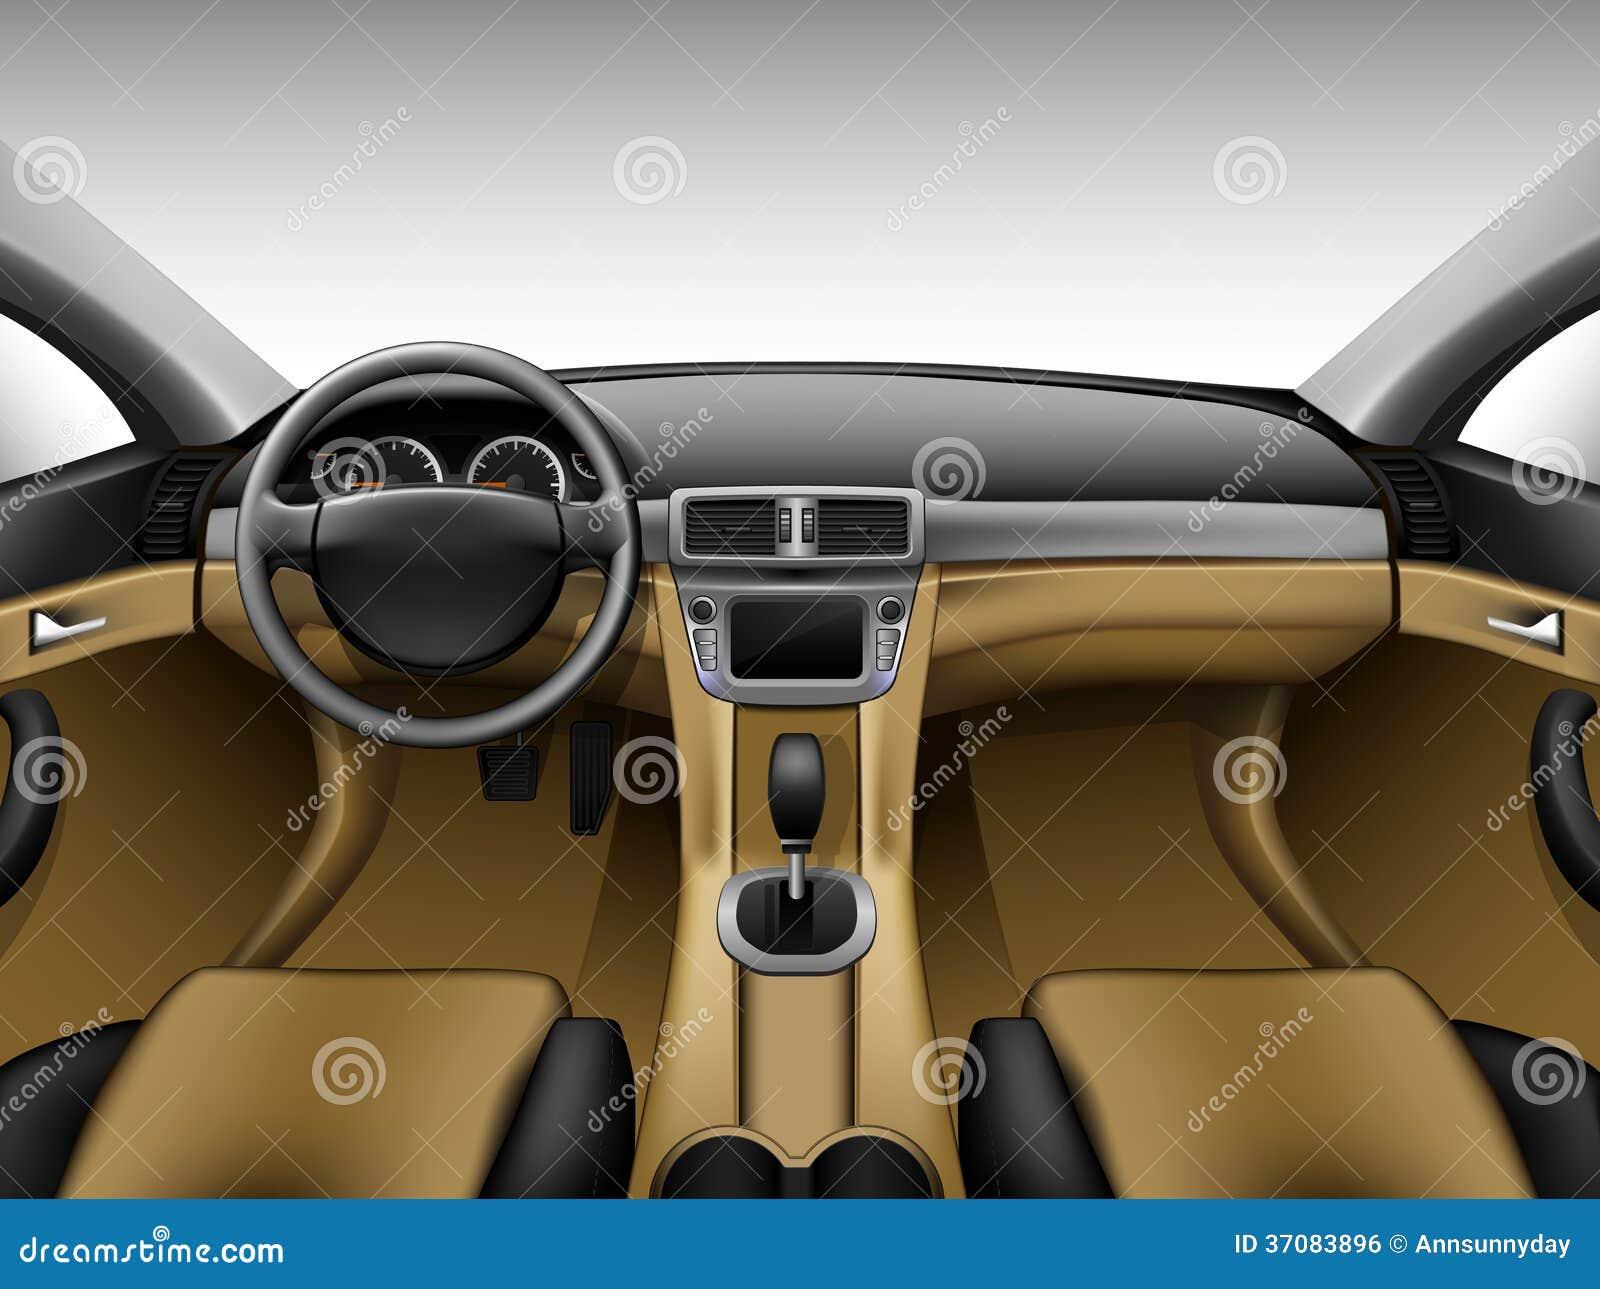 light beige leather car interior royalty free stock image image 37083896. Black Bedroom Furniture Sets. Home Design Ideas